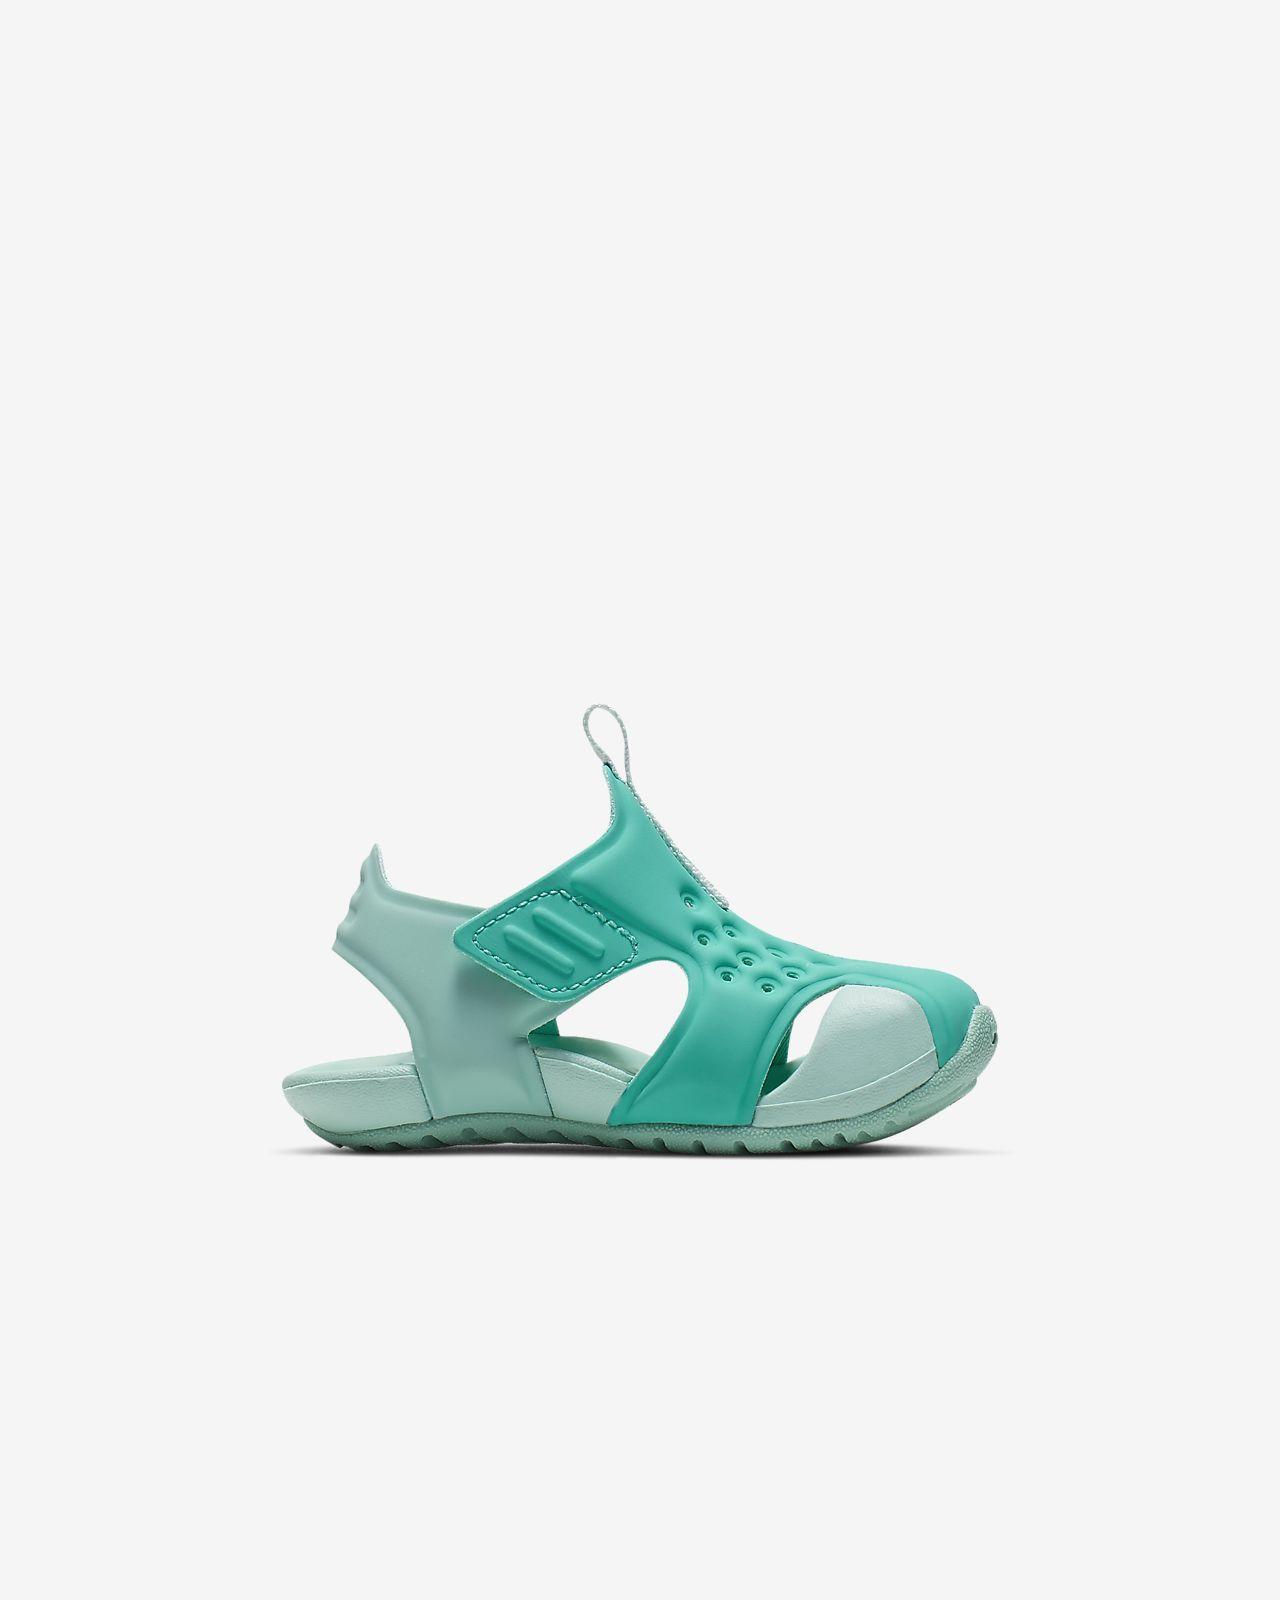 5cd489b5ad51 Nike Sunray Protect 2 Baby   Toddler Sandal. Nike.com CA